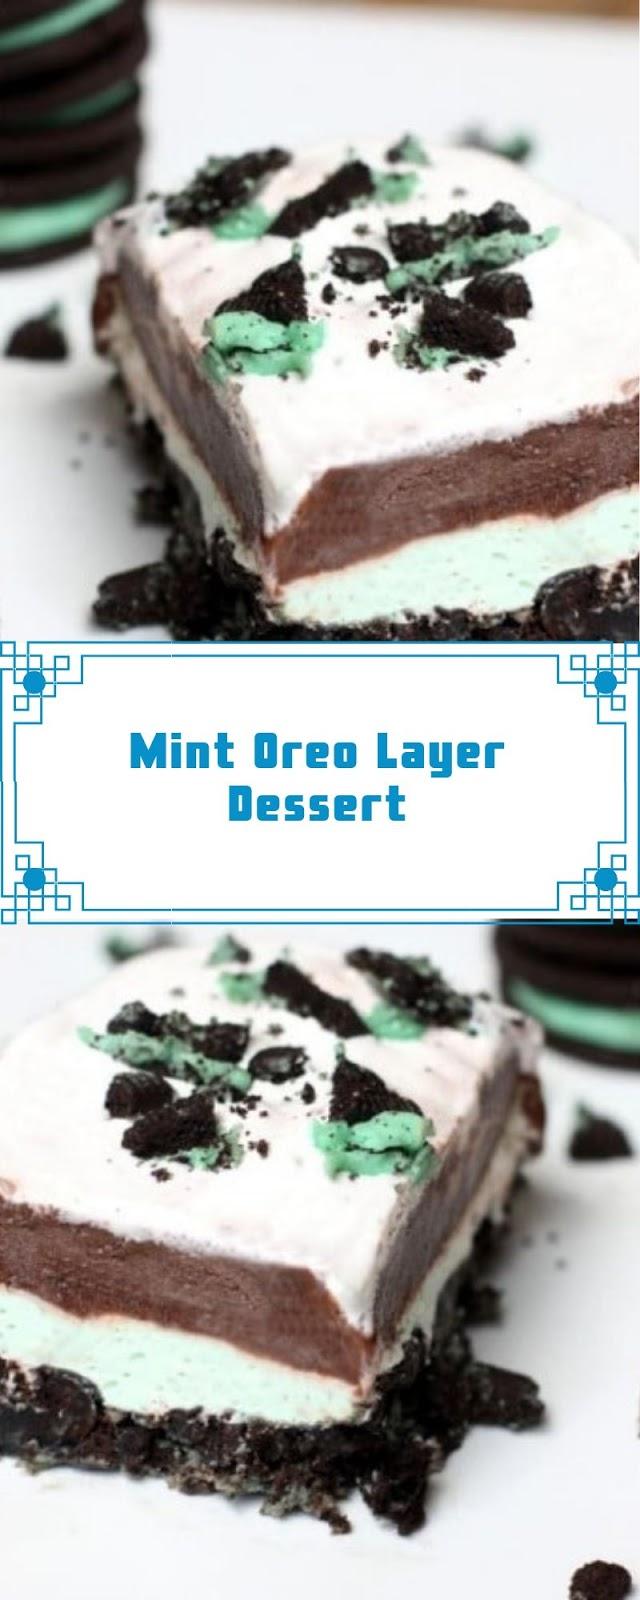 Mint Oreo Layer Dessert